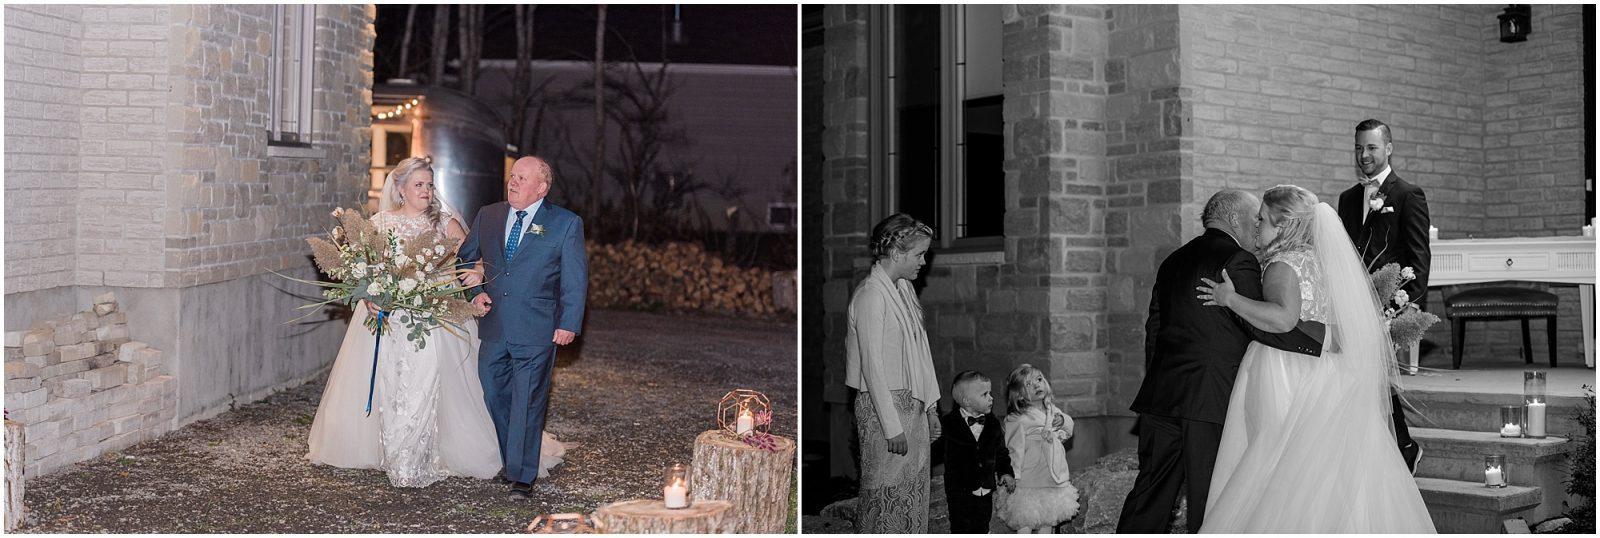 0092 Bethany and Luc - Fall Backyard Ottawa Wedding - Copper and Navy - PhotosbyEmmaH.jpg